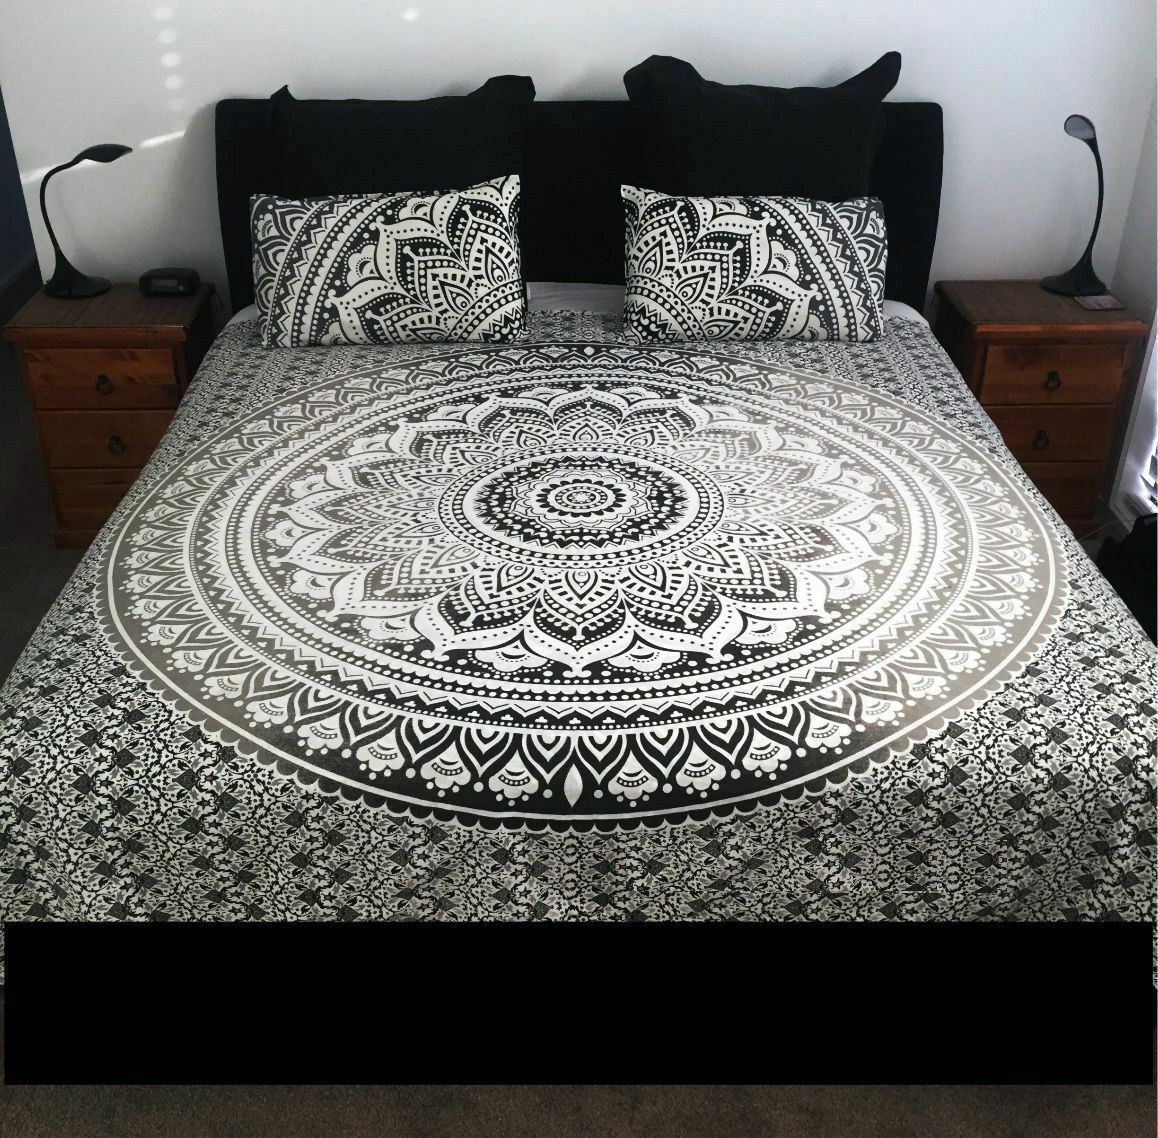 Bohemian Mandala Bedding Quilt Duvet Doona Cover Set Queen Size Comforter Set 0